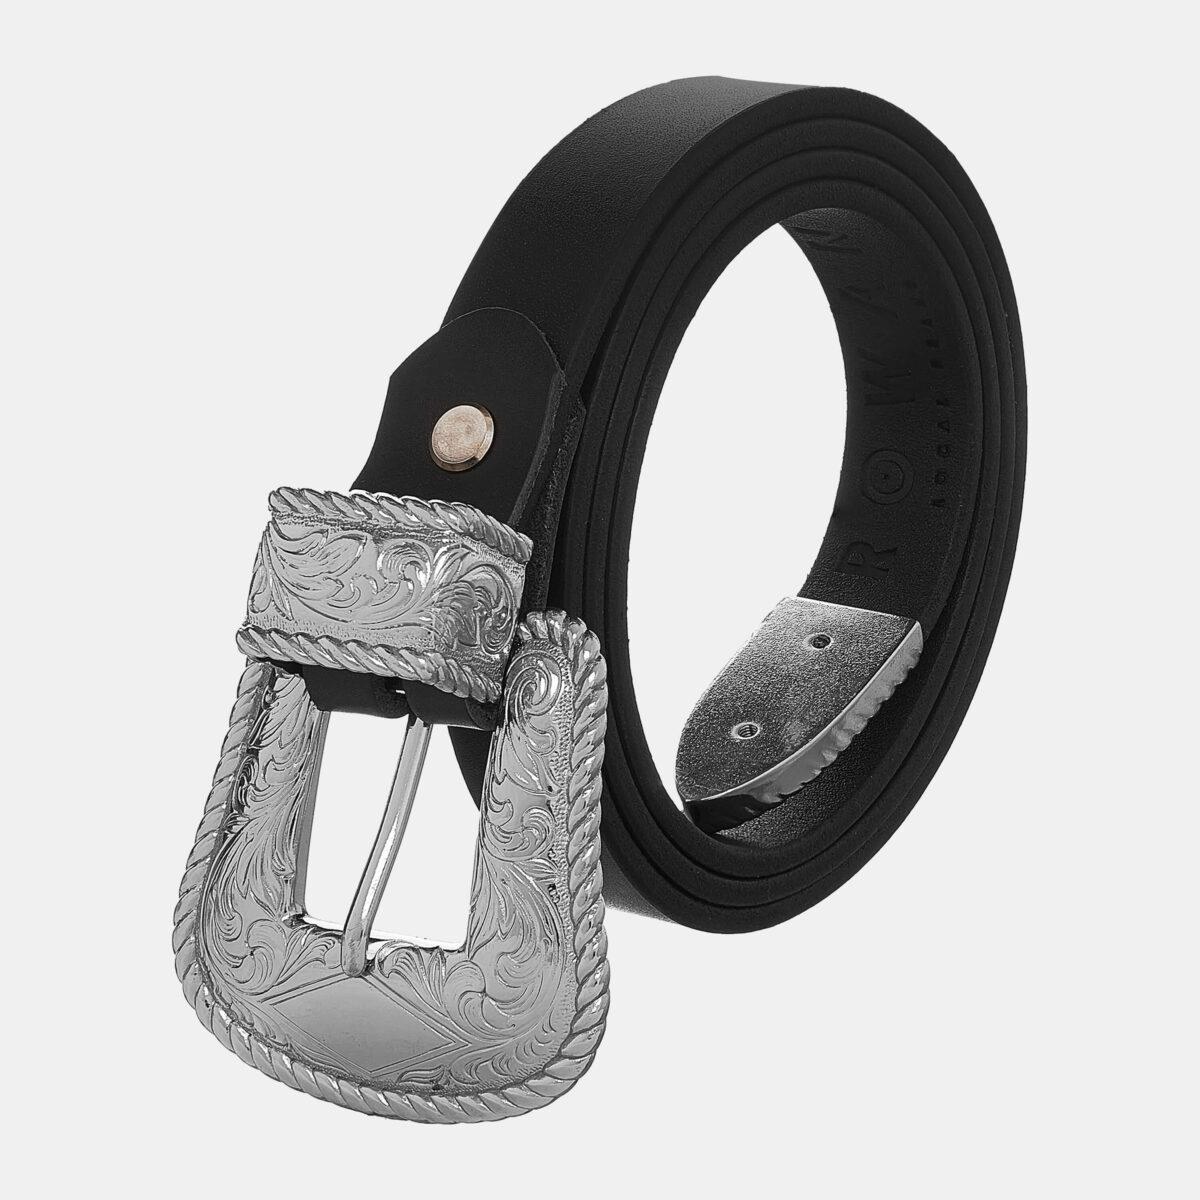 Rowan Aiioy – Belts [B.L 2] Rowan AIIoy Belts BL 2 Product thumbnail 1